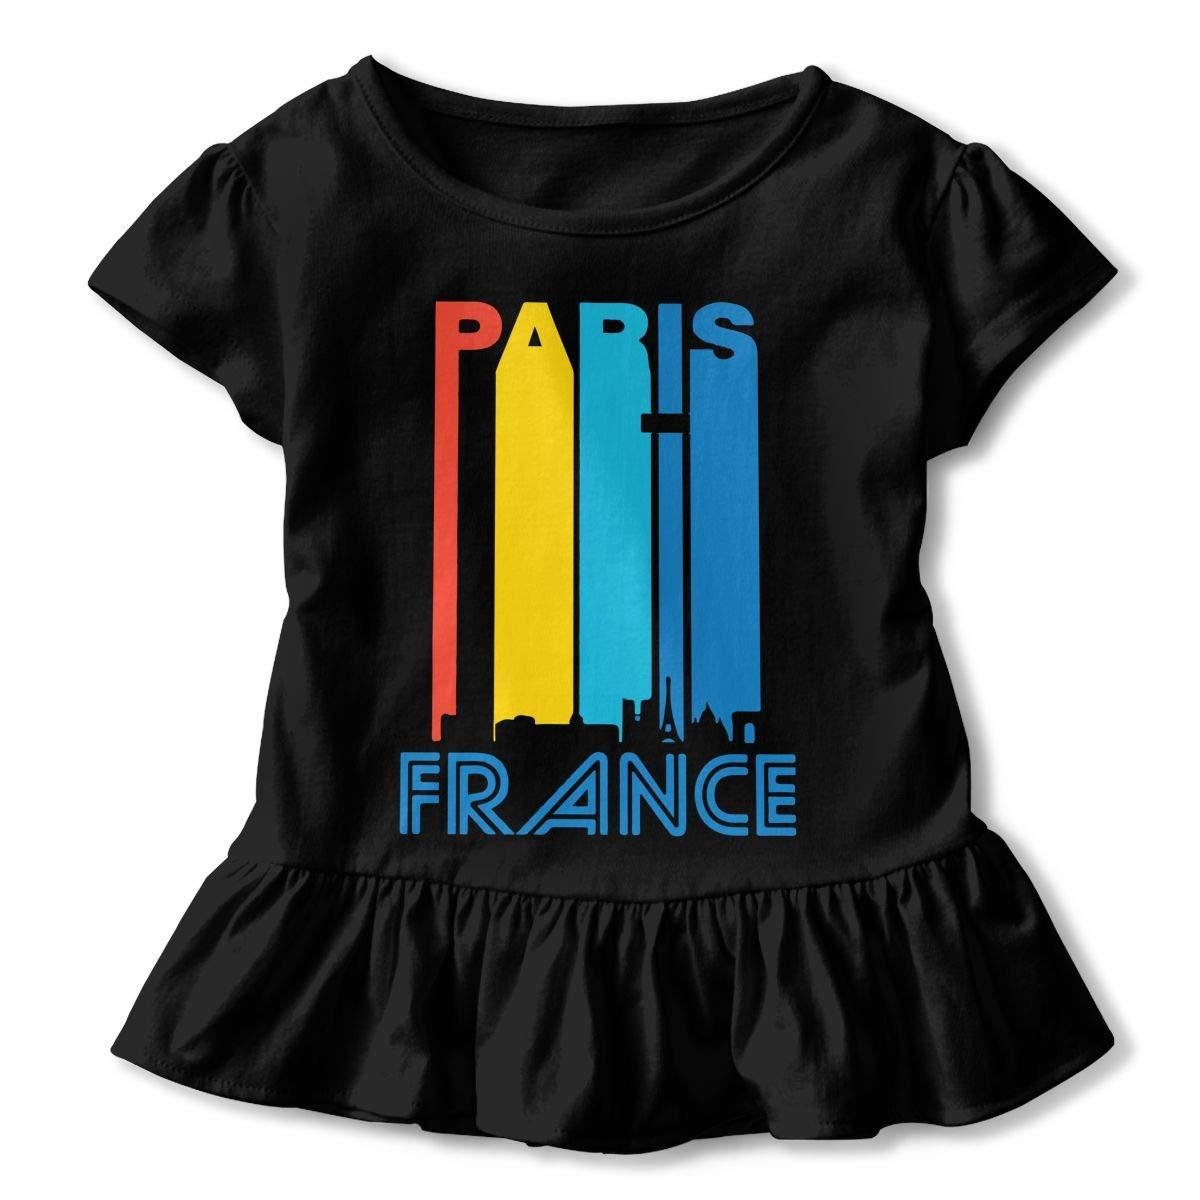 Retro 1970s Paris France Cityscape Downtown Skyline Kids Girls Short Sleeve T Shirts Ruffles Shirt Tee Jersey for 2-6T